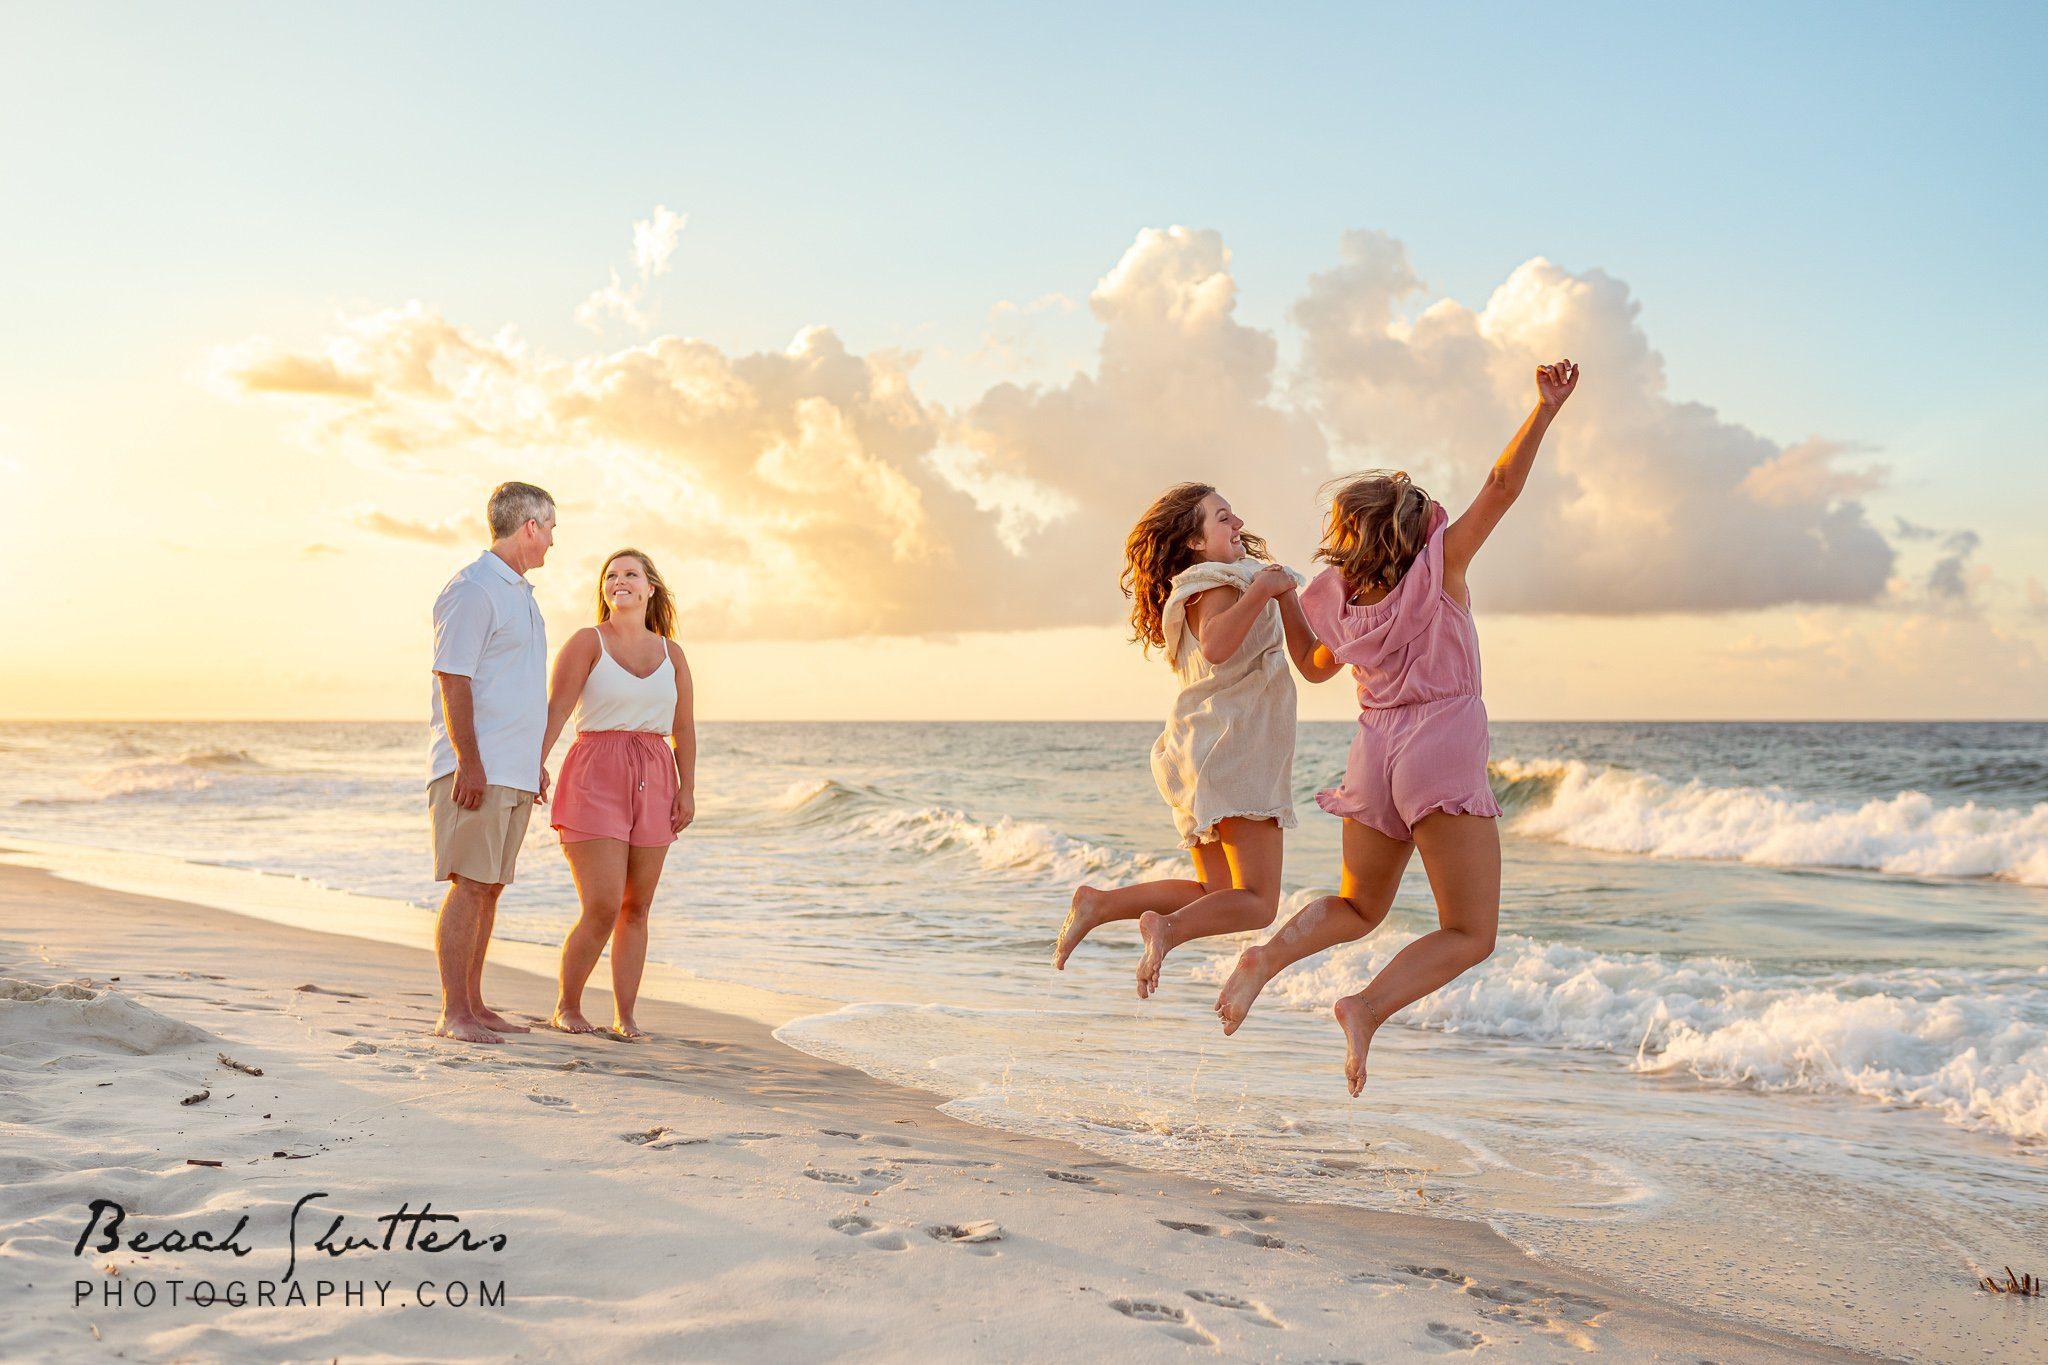 Alabama beach vacations